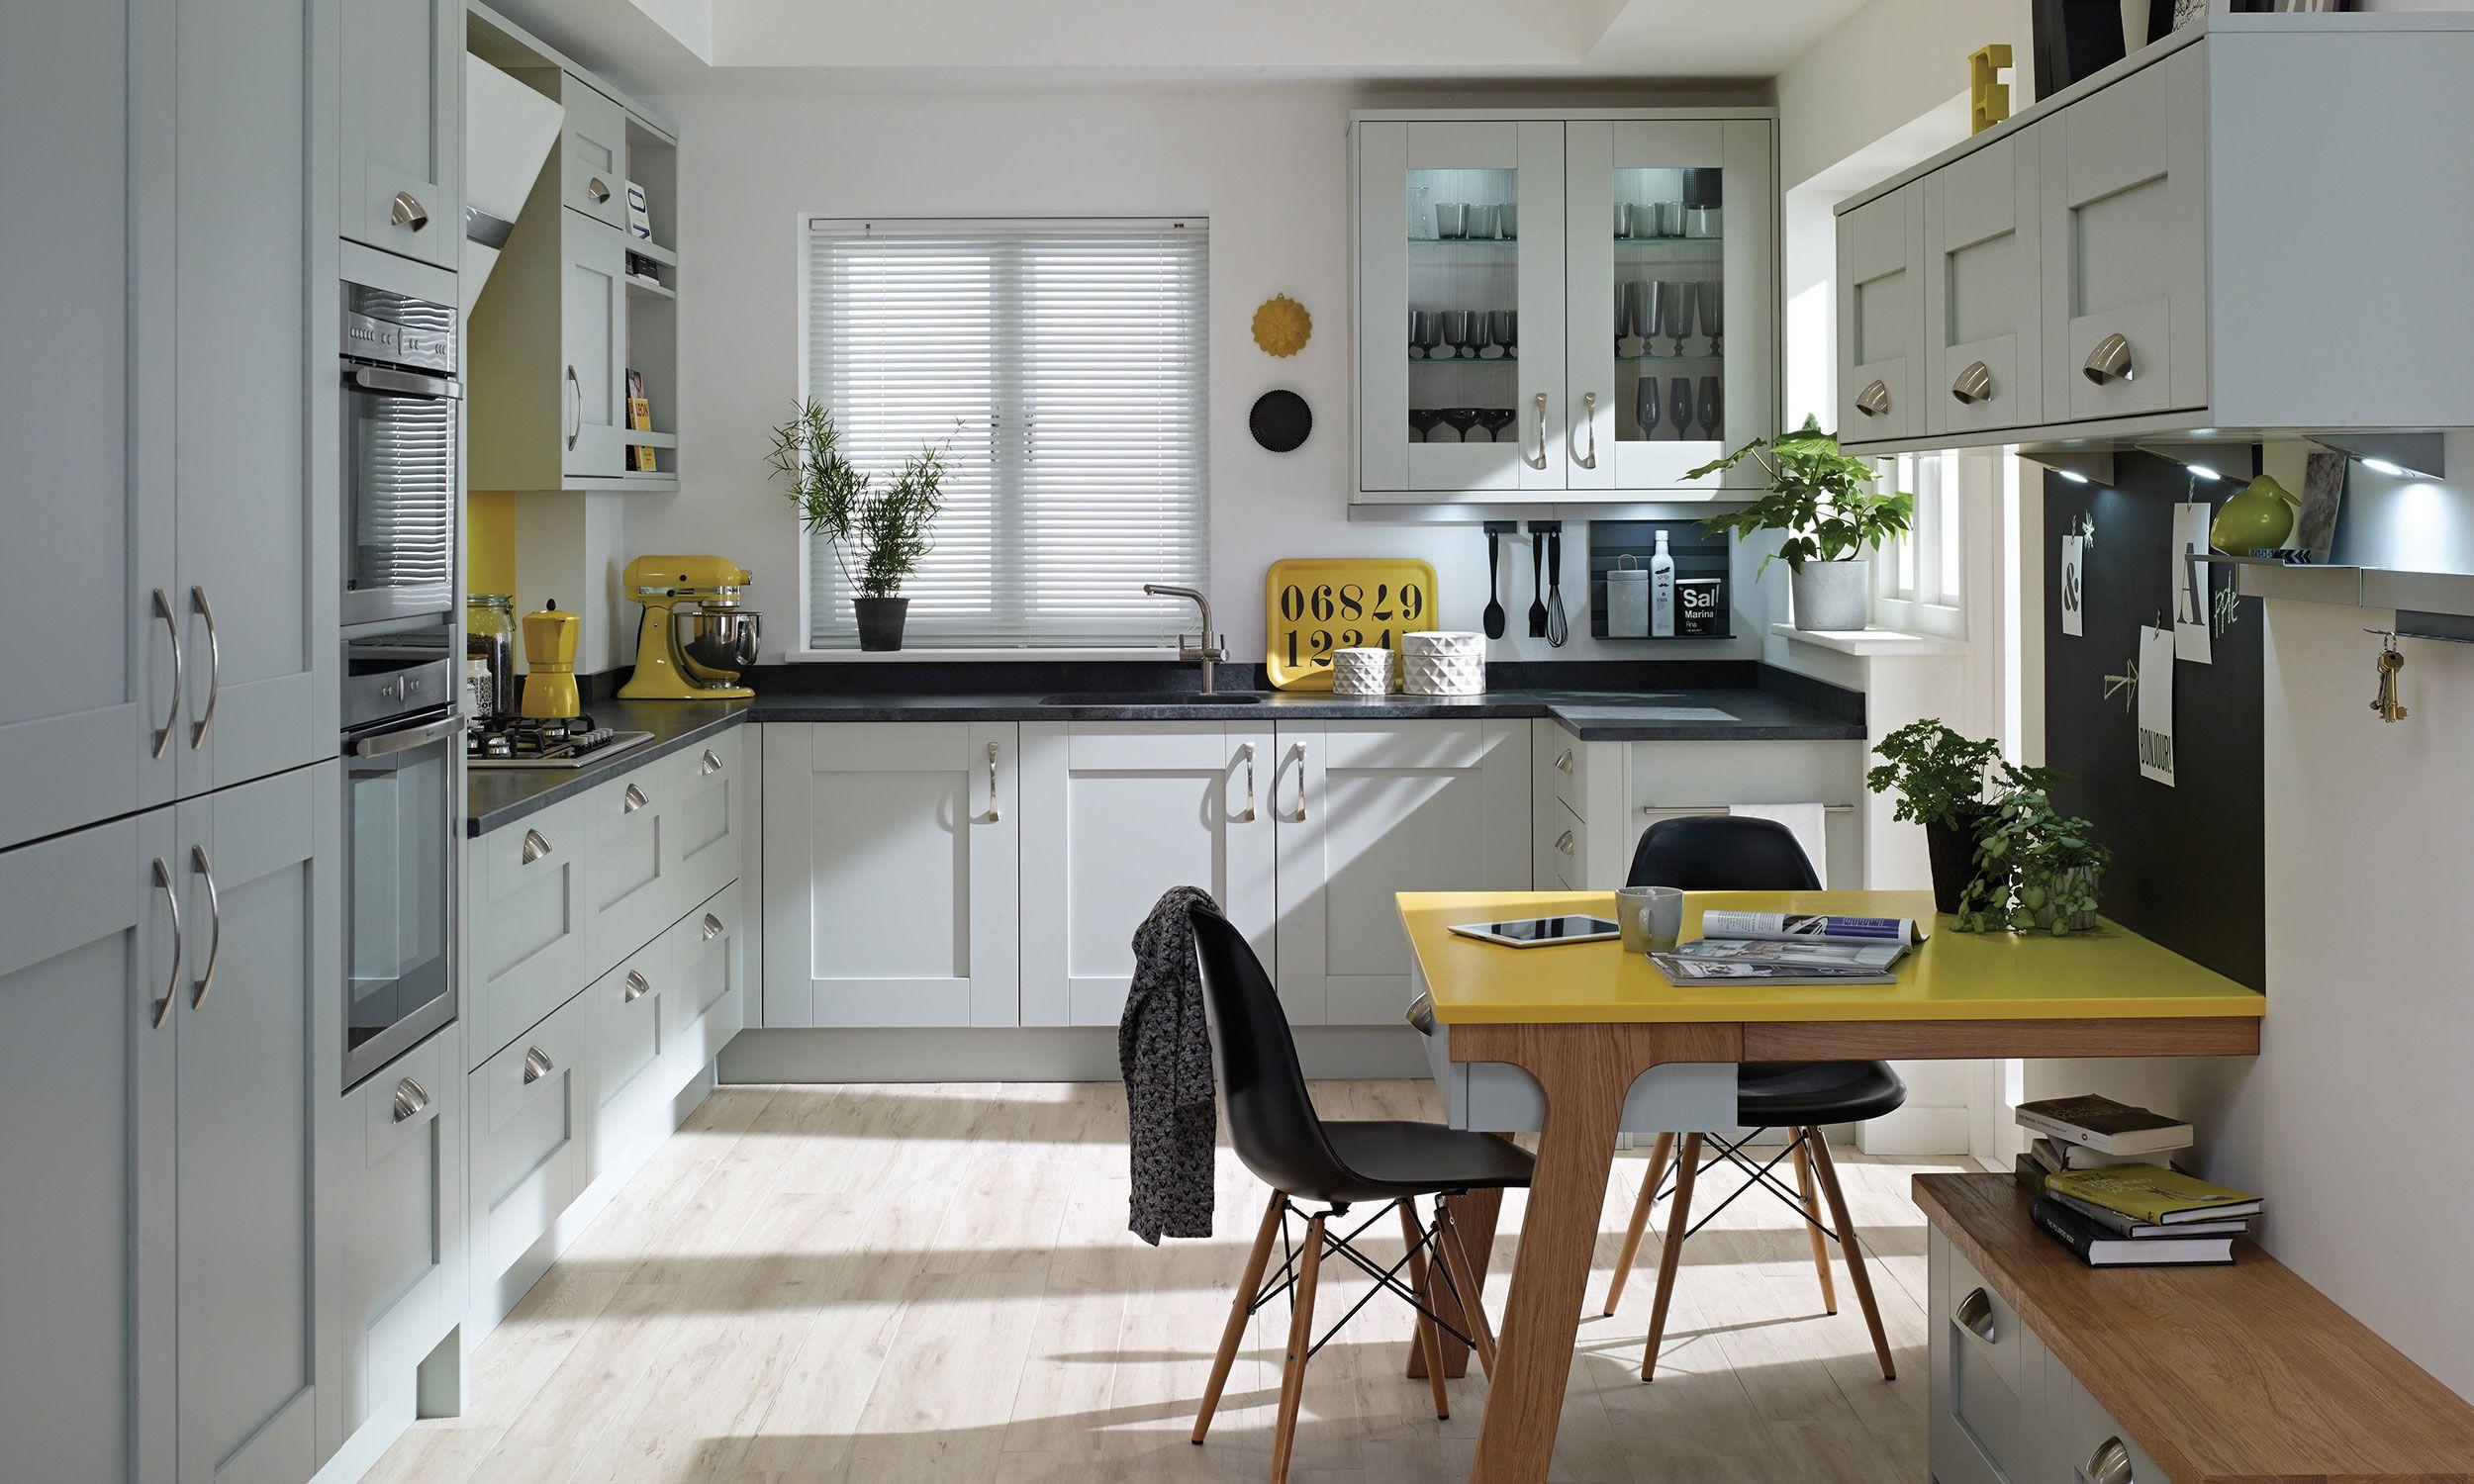 Milbourne Shaker style kitchens, Classic kitchens